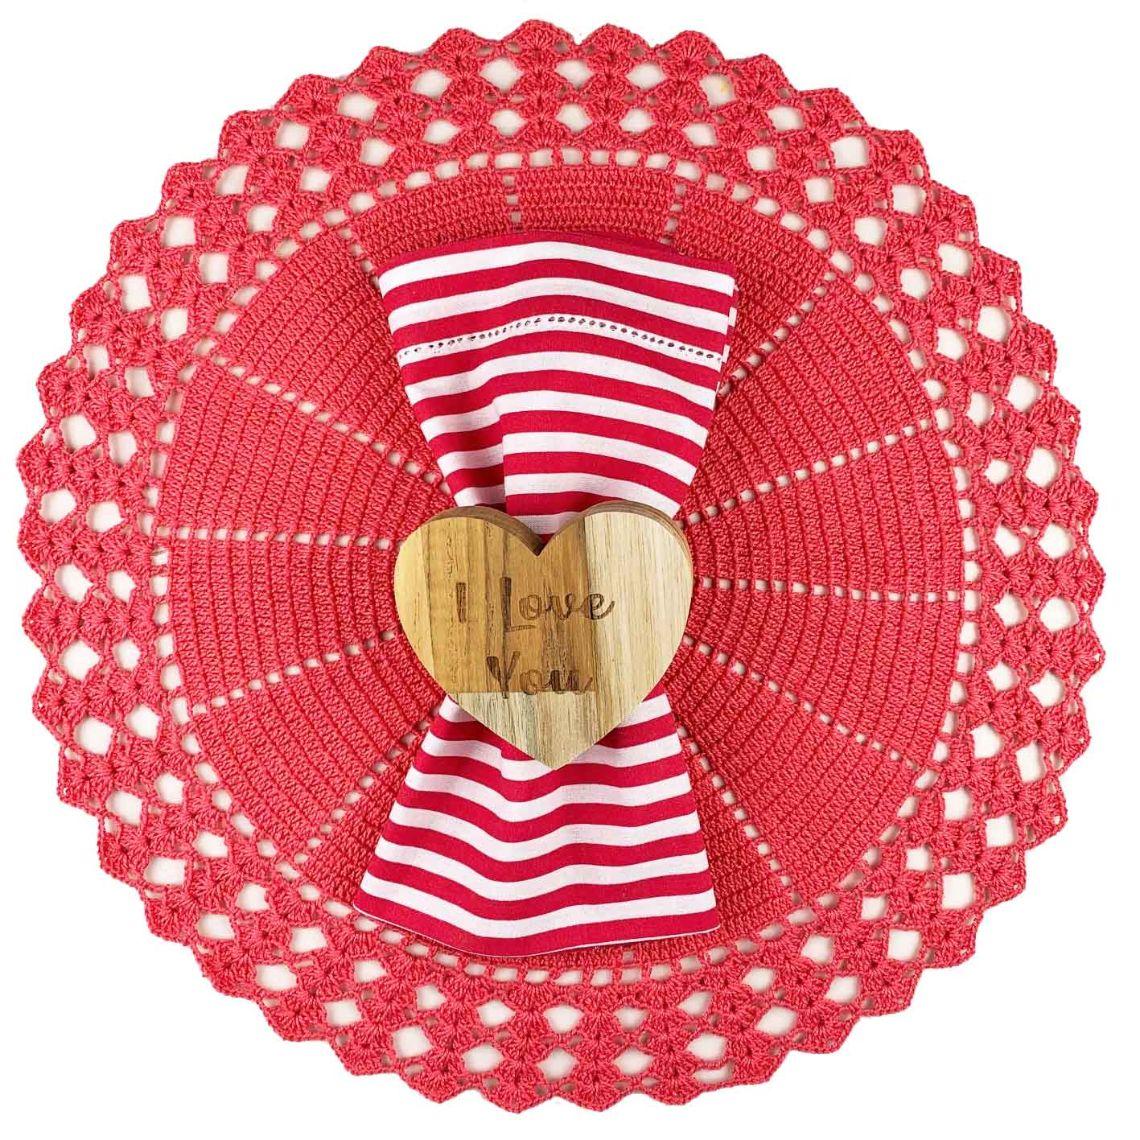 Box Coral Red c/ 6 peças